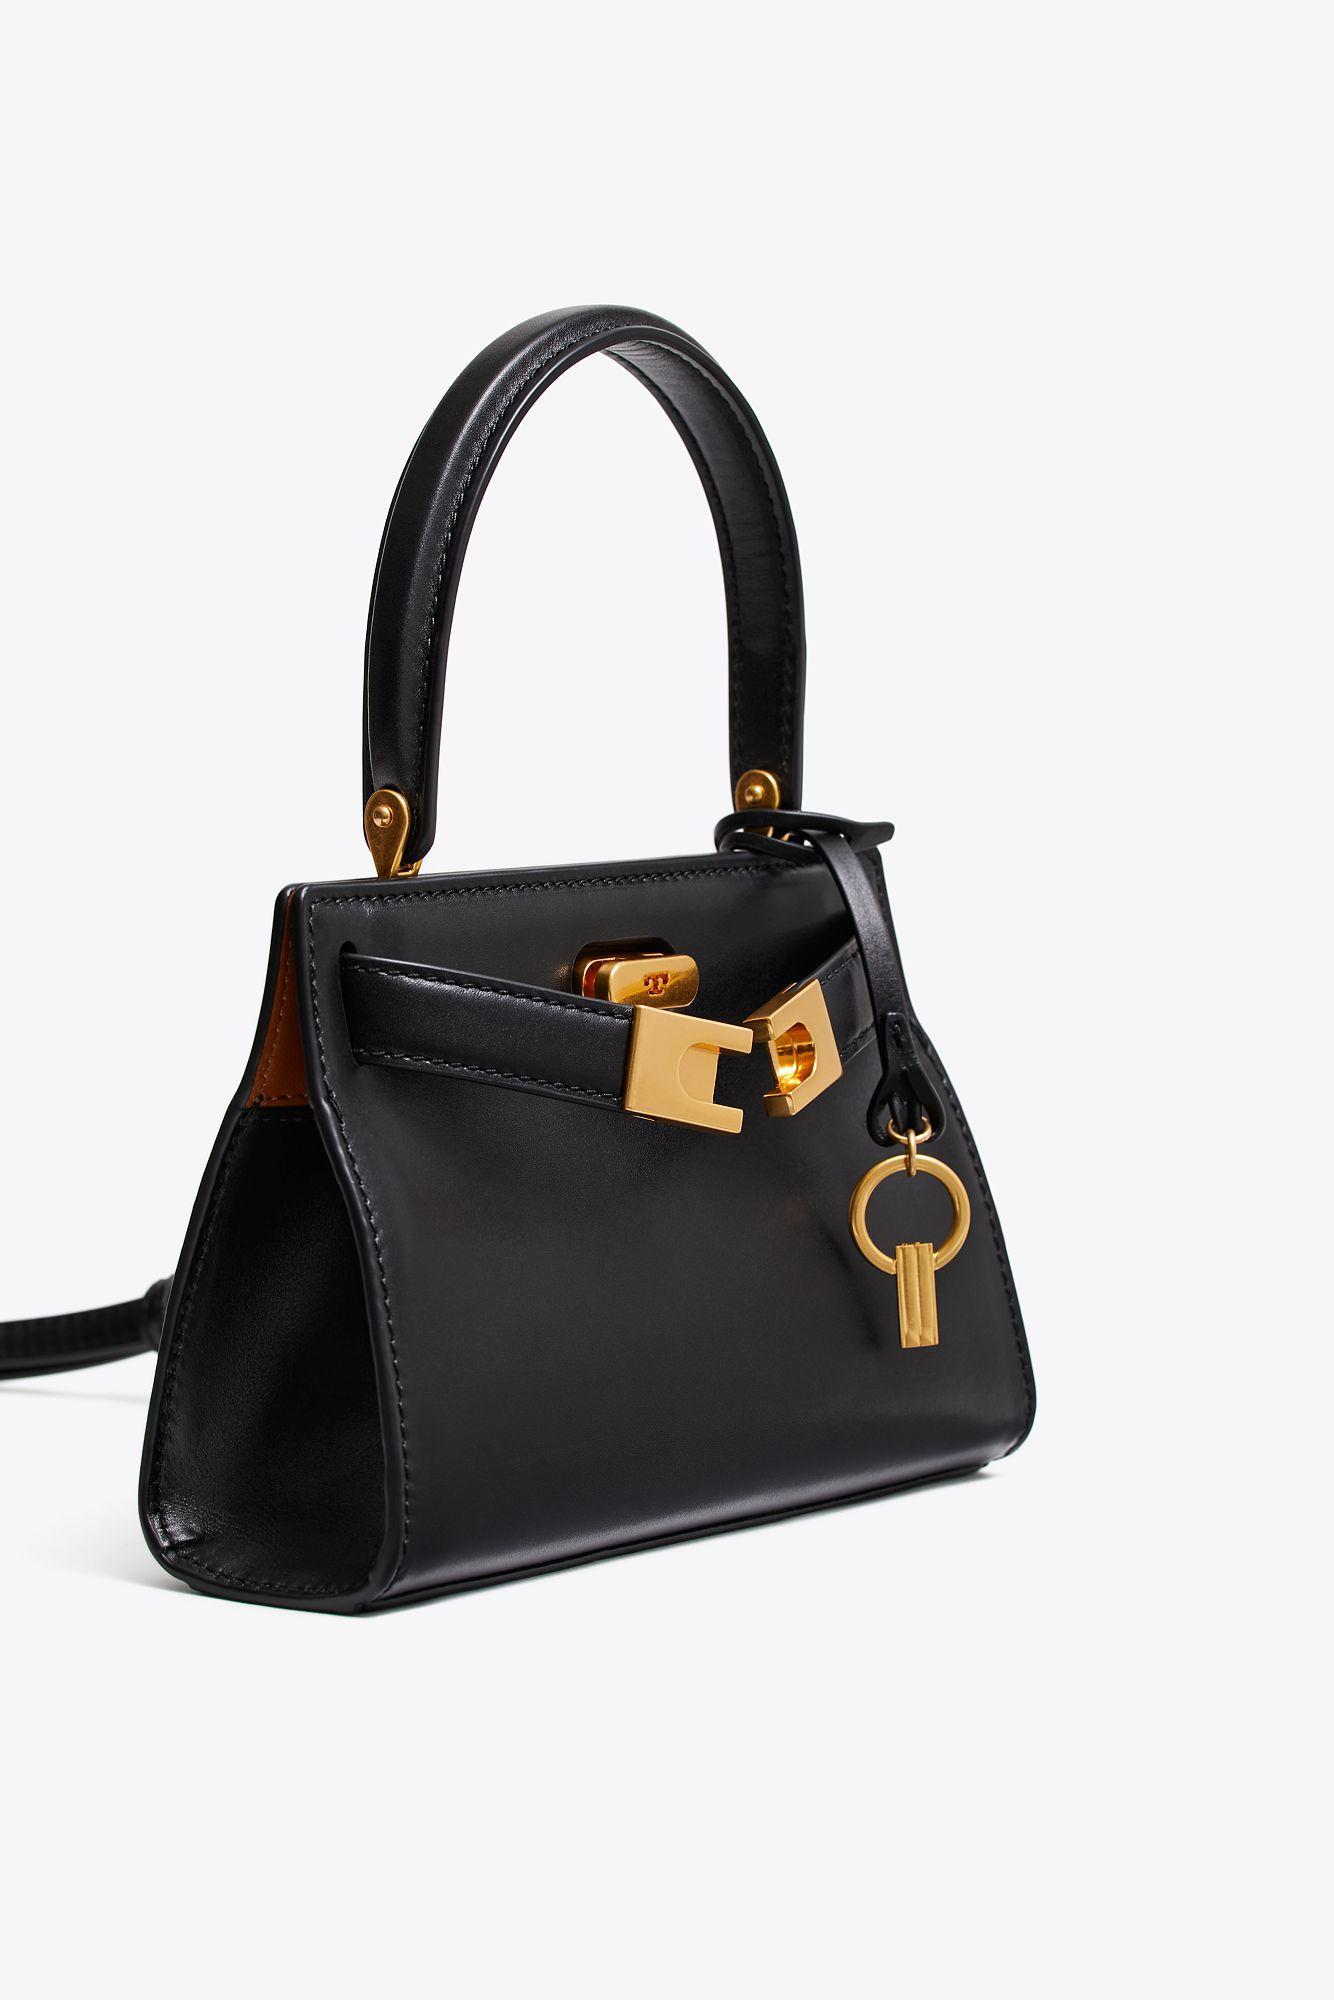 25b9e80e568d Tory Burch - Black Lee Radziwill Petite Bag - Lyst. View fullscreen